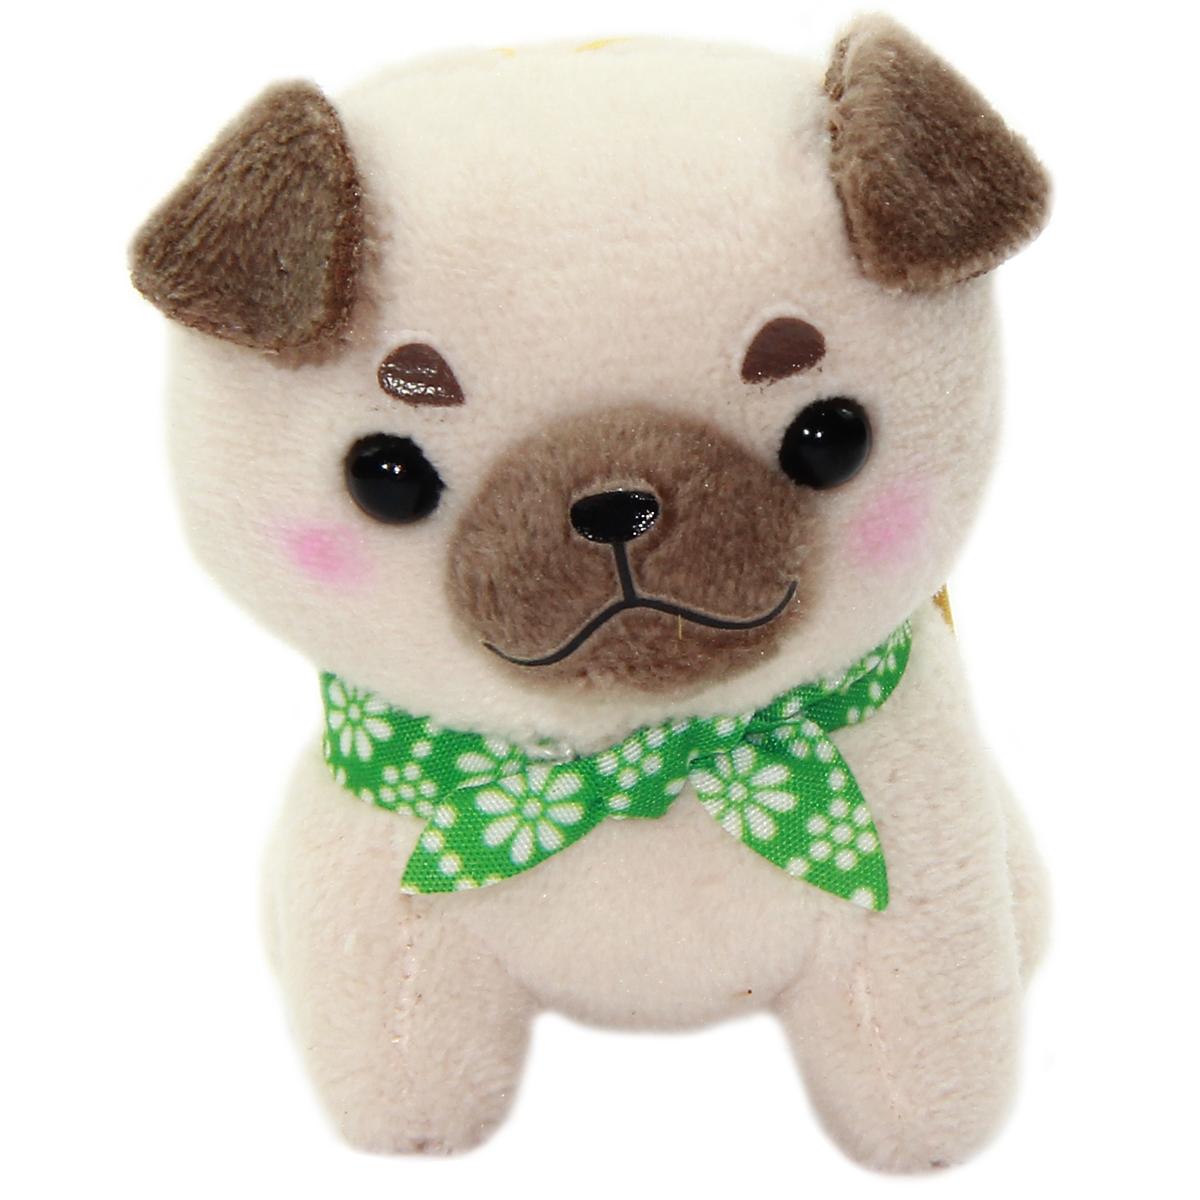 Amuse Dog Plushie, Mameshiba San Kyodai Pugbee Beige Small Plushie Strap 3 Inches